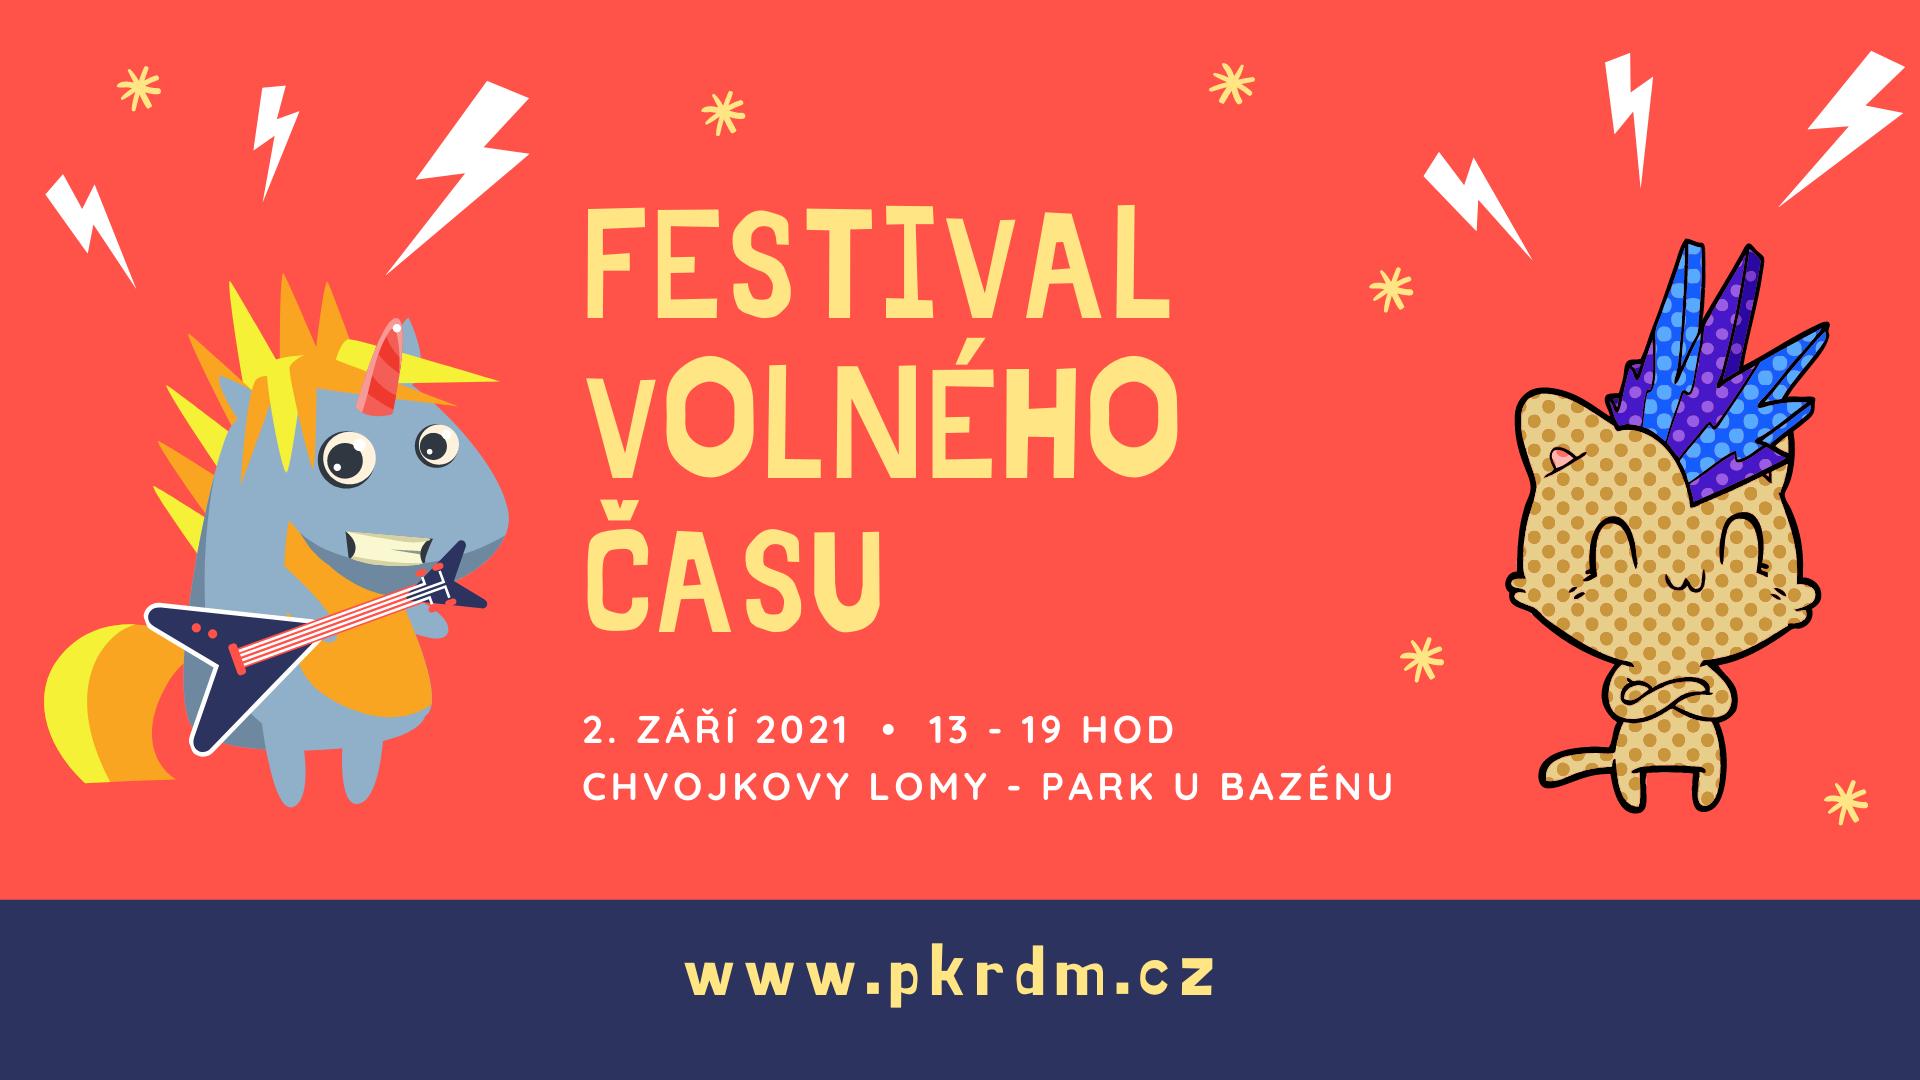 Video z Festivalu volného času 2021 je tu!